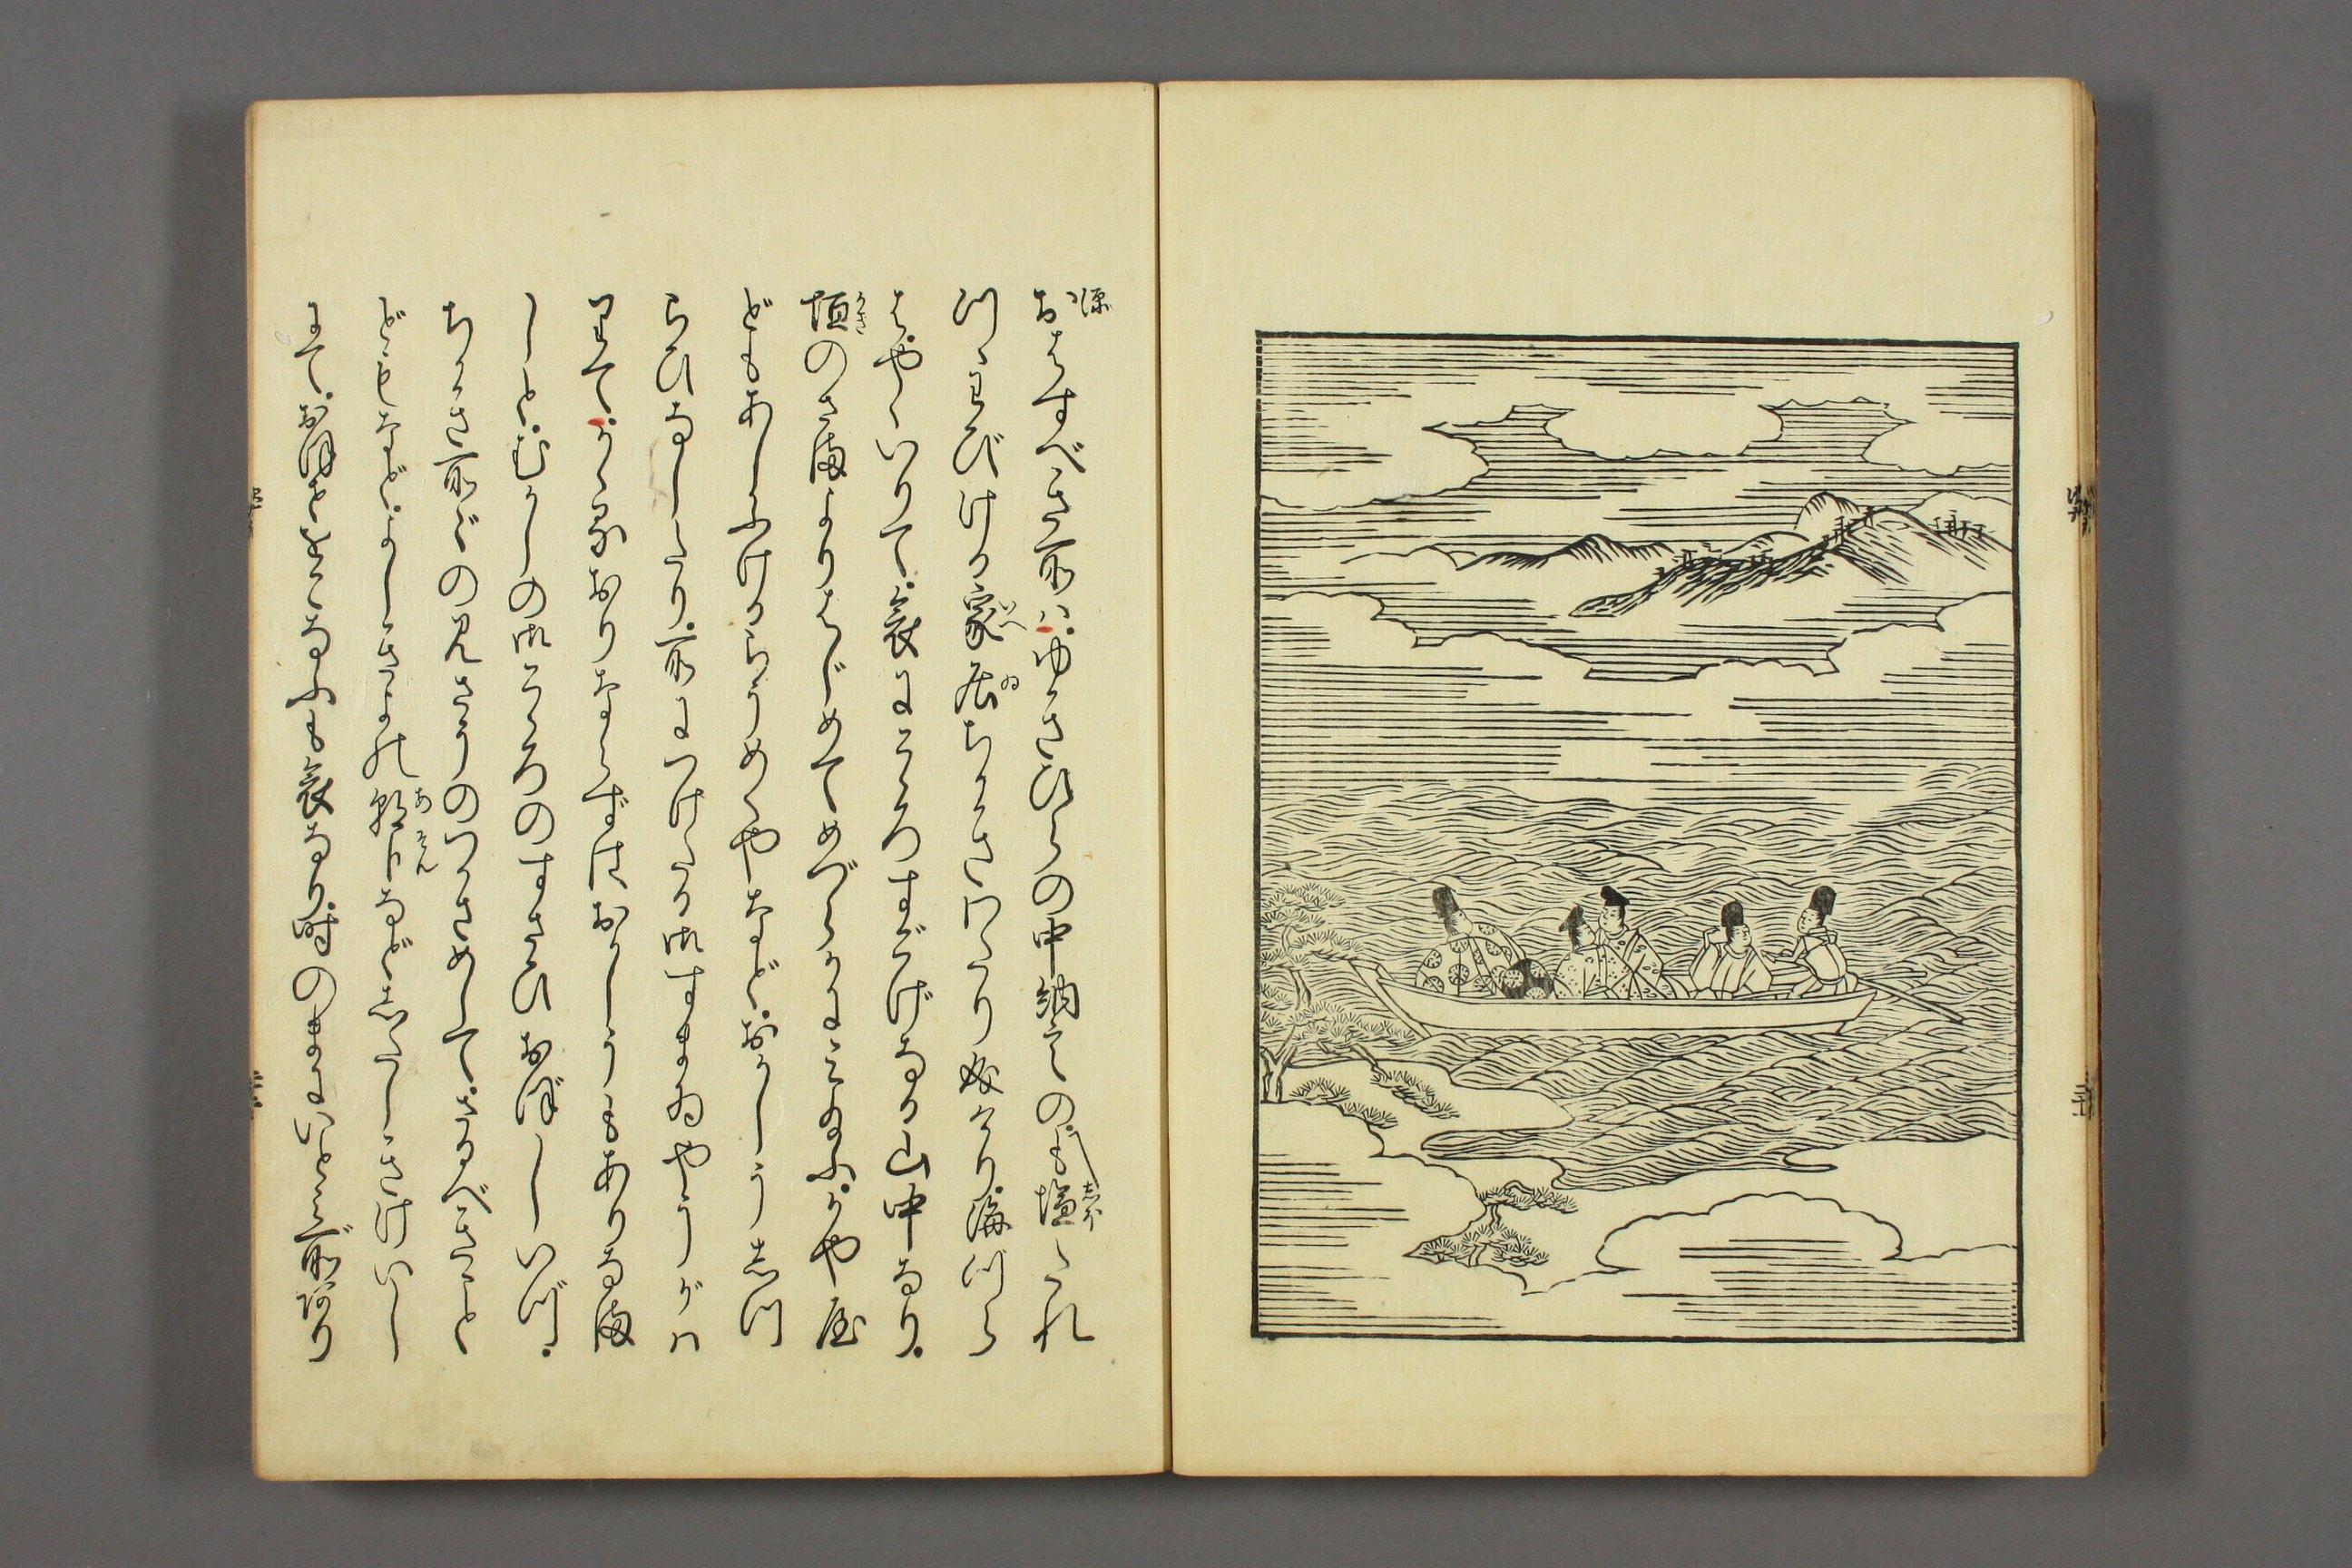 http://archive.wul.waseda.ac.jp/kosho/bunko30/bunko30_a0007/bunko30_a0007_0012/bunko30_a0007_0012_p0023.jpg